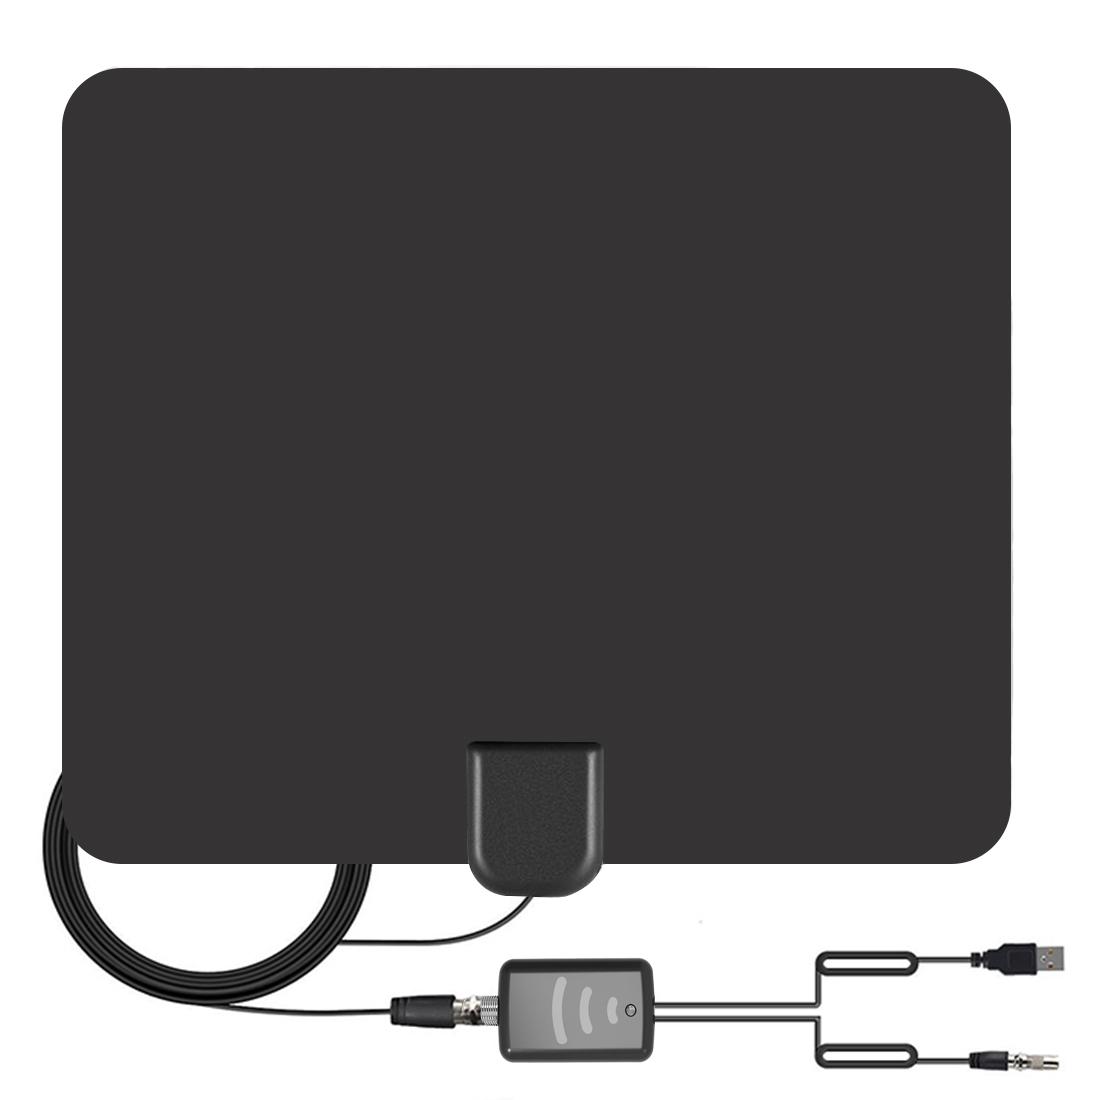 HDTV Antenna High Signal Antenna HDTV ANTNANE Antennas